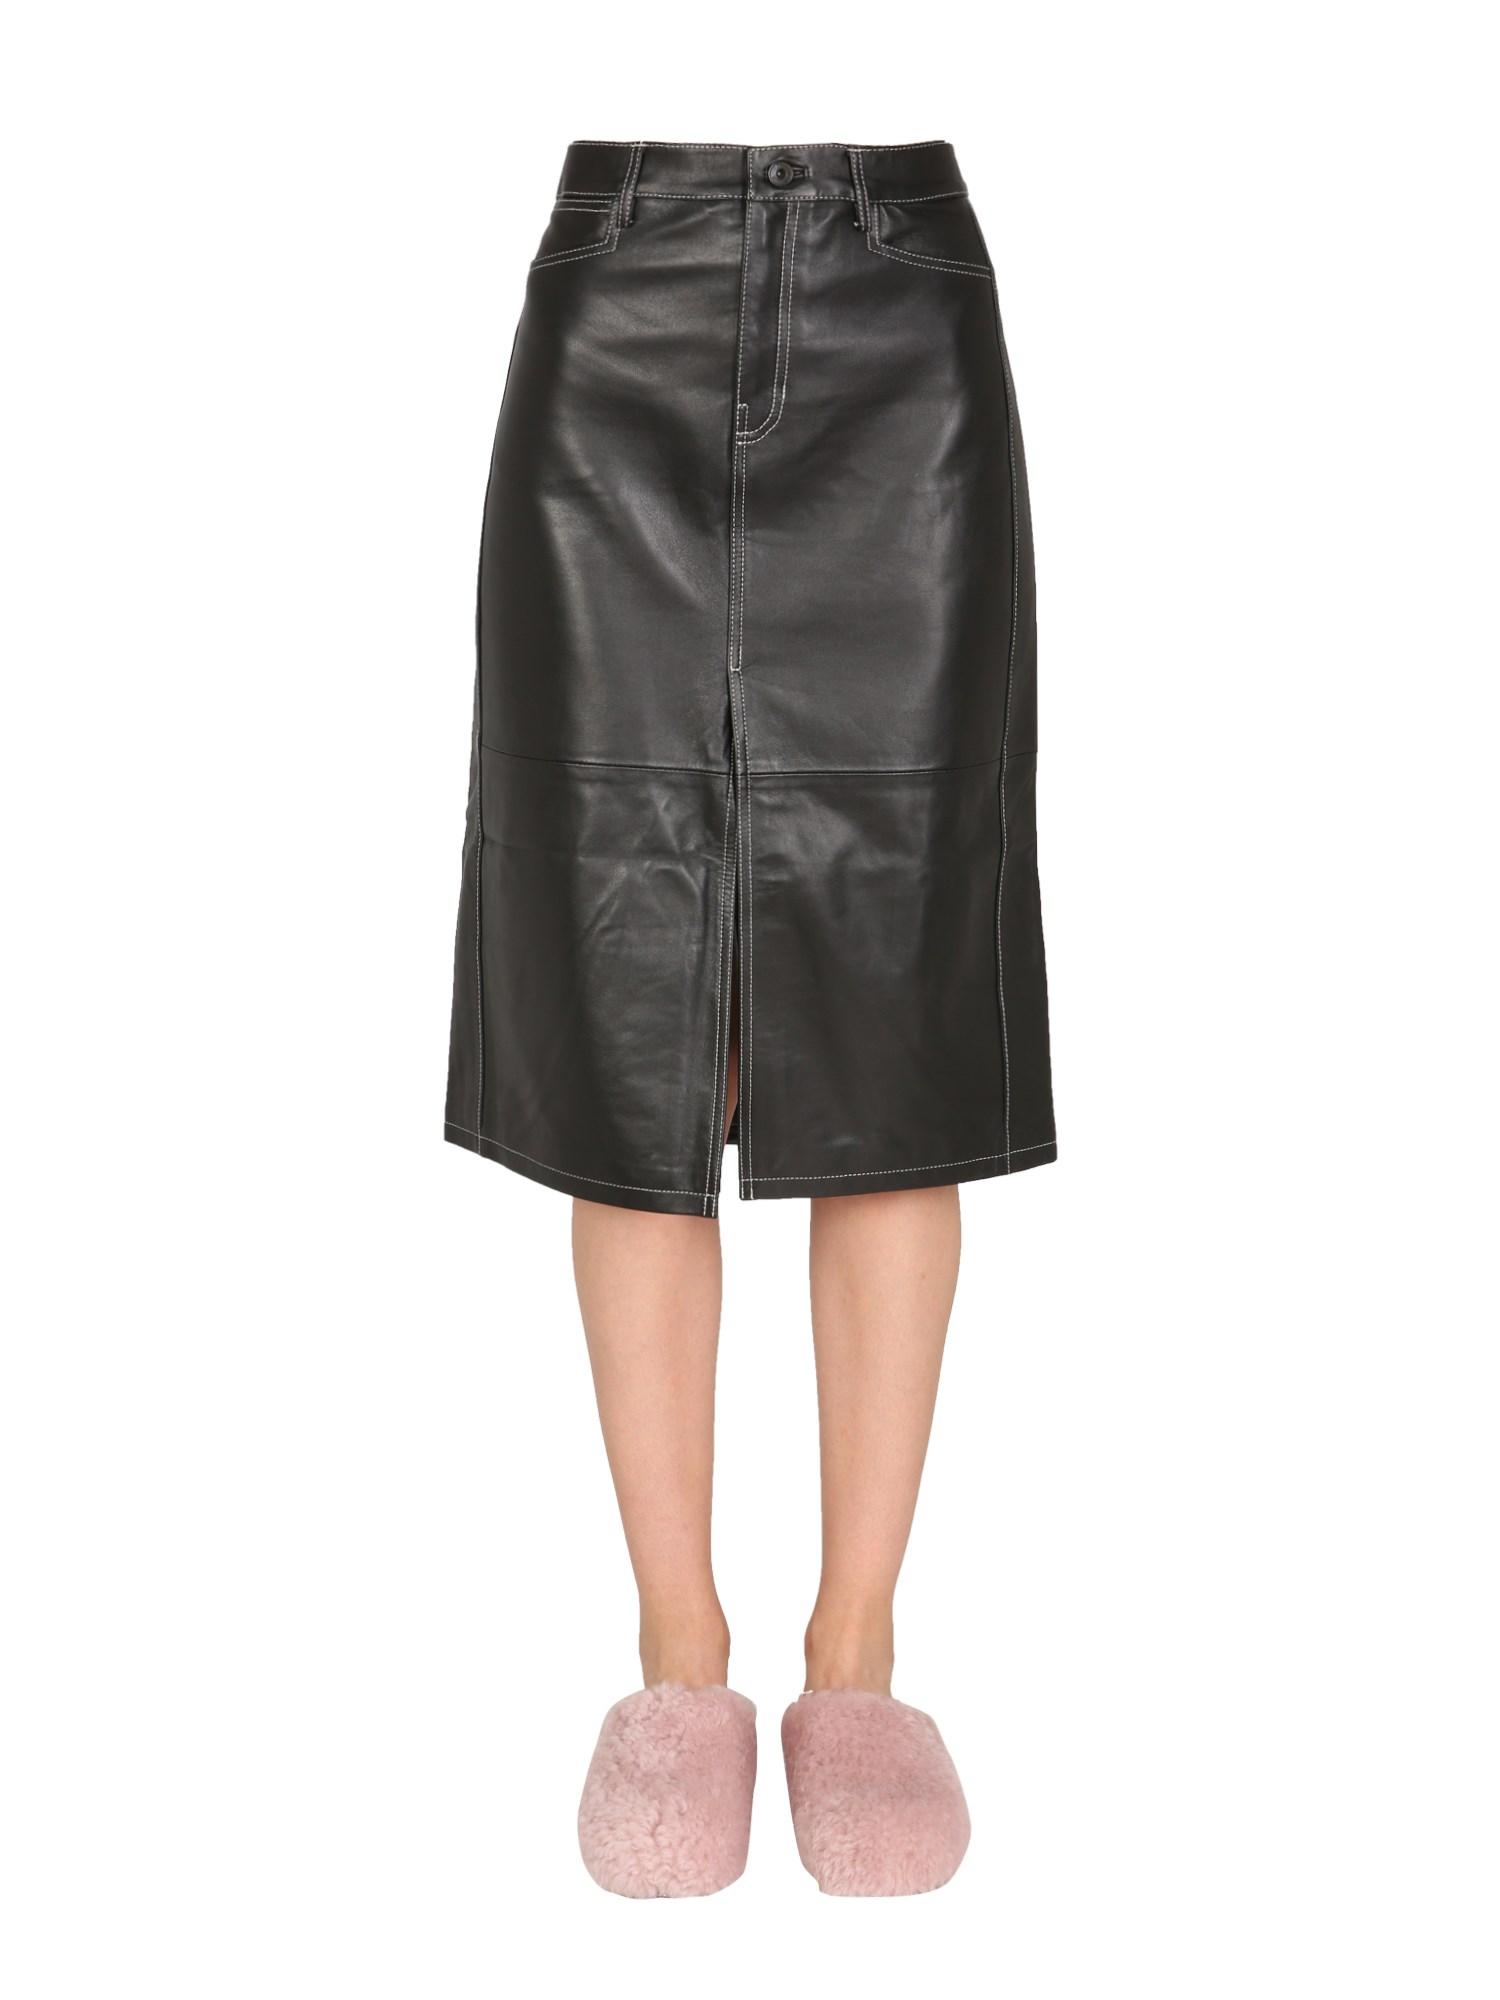 Nappa leather skirt - proenza schouler white label - Modalova